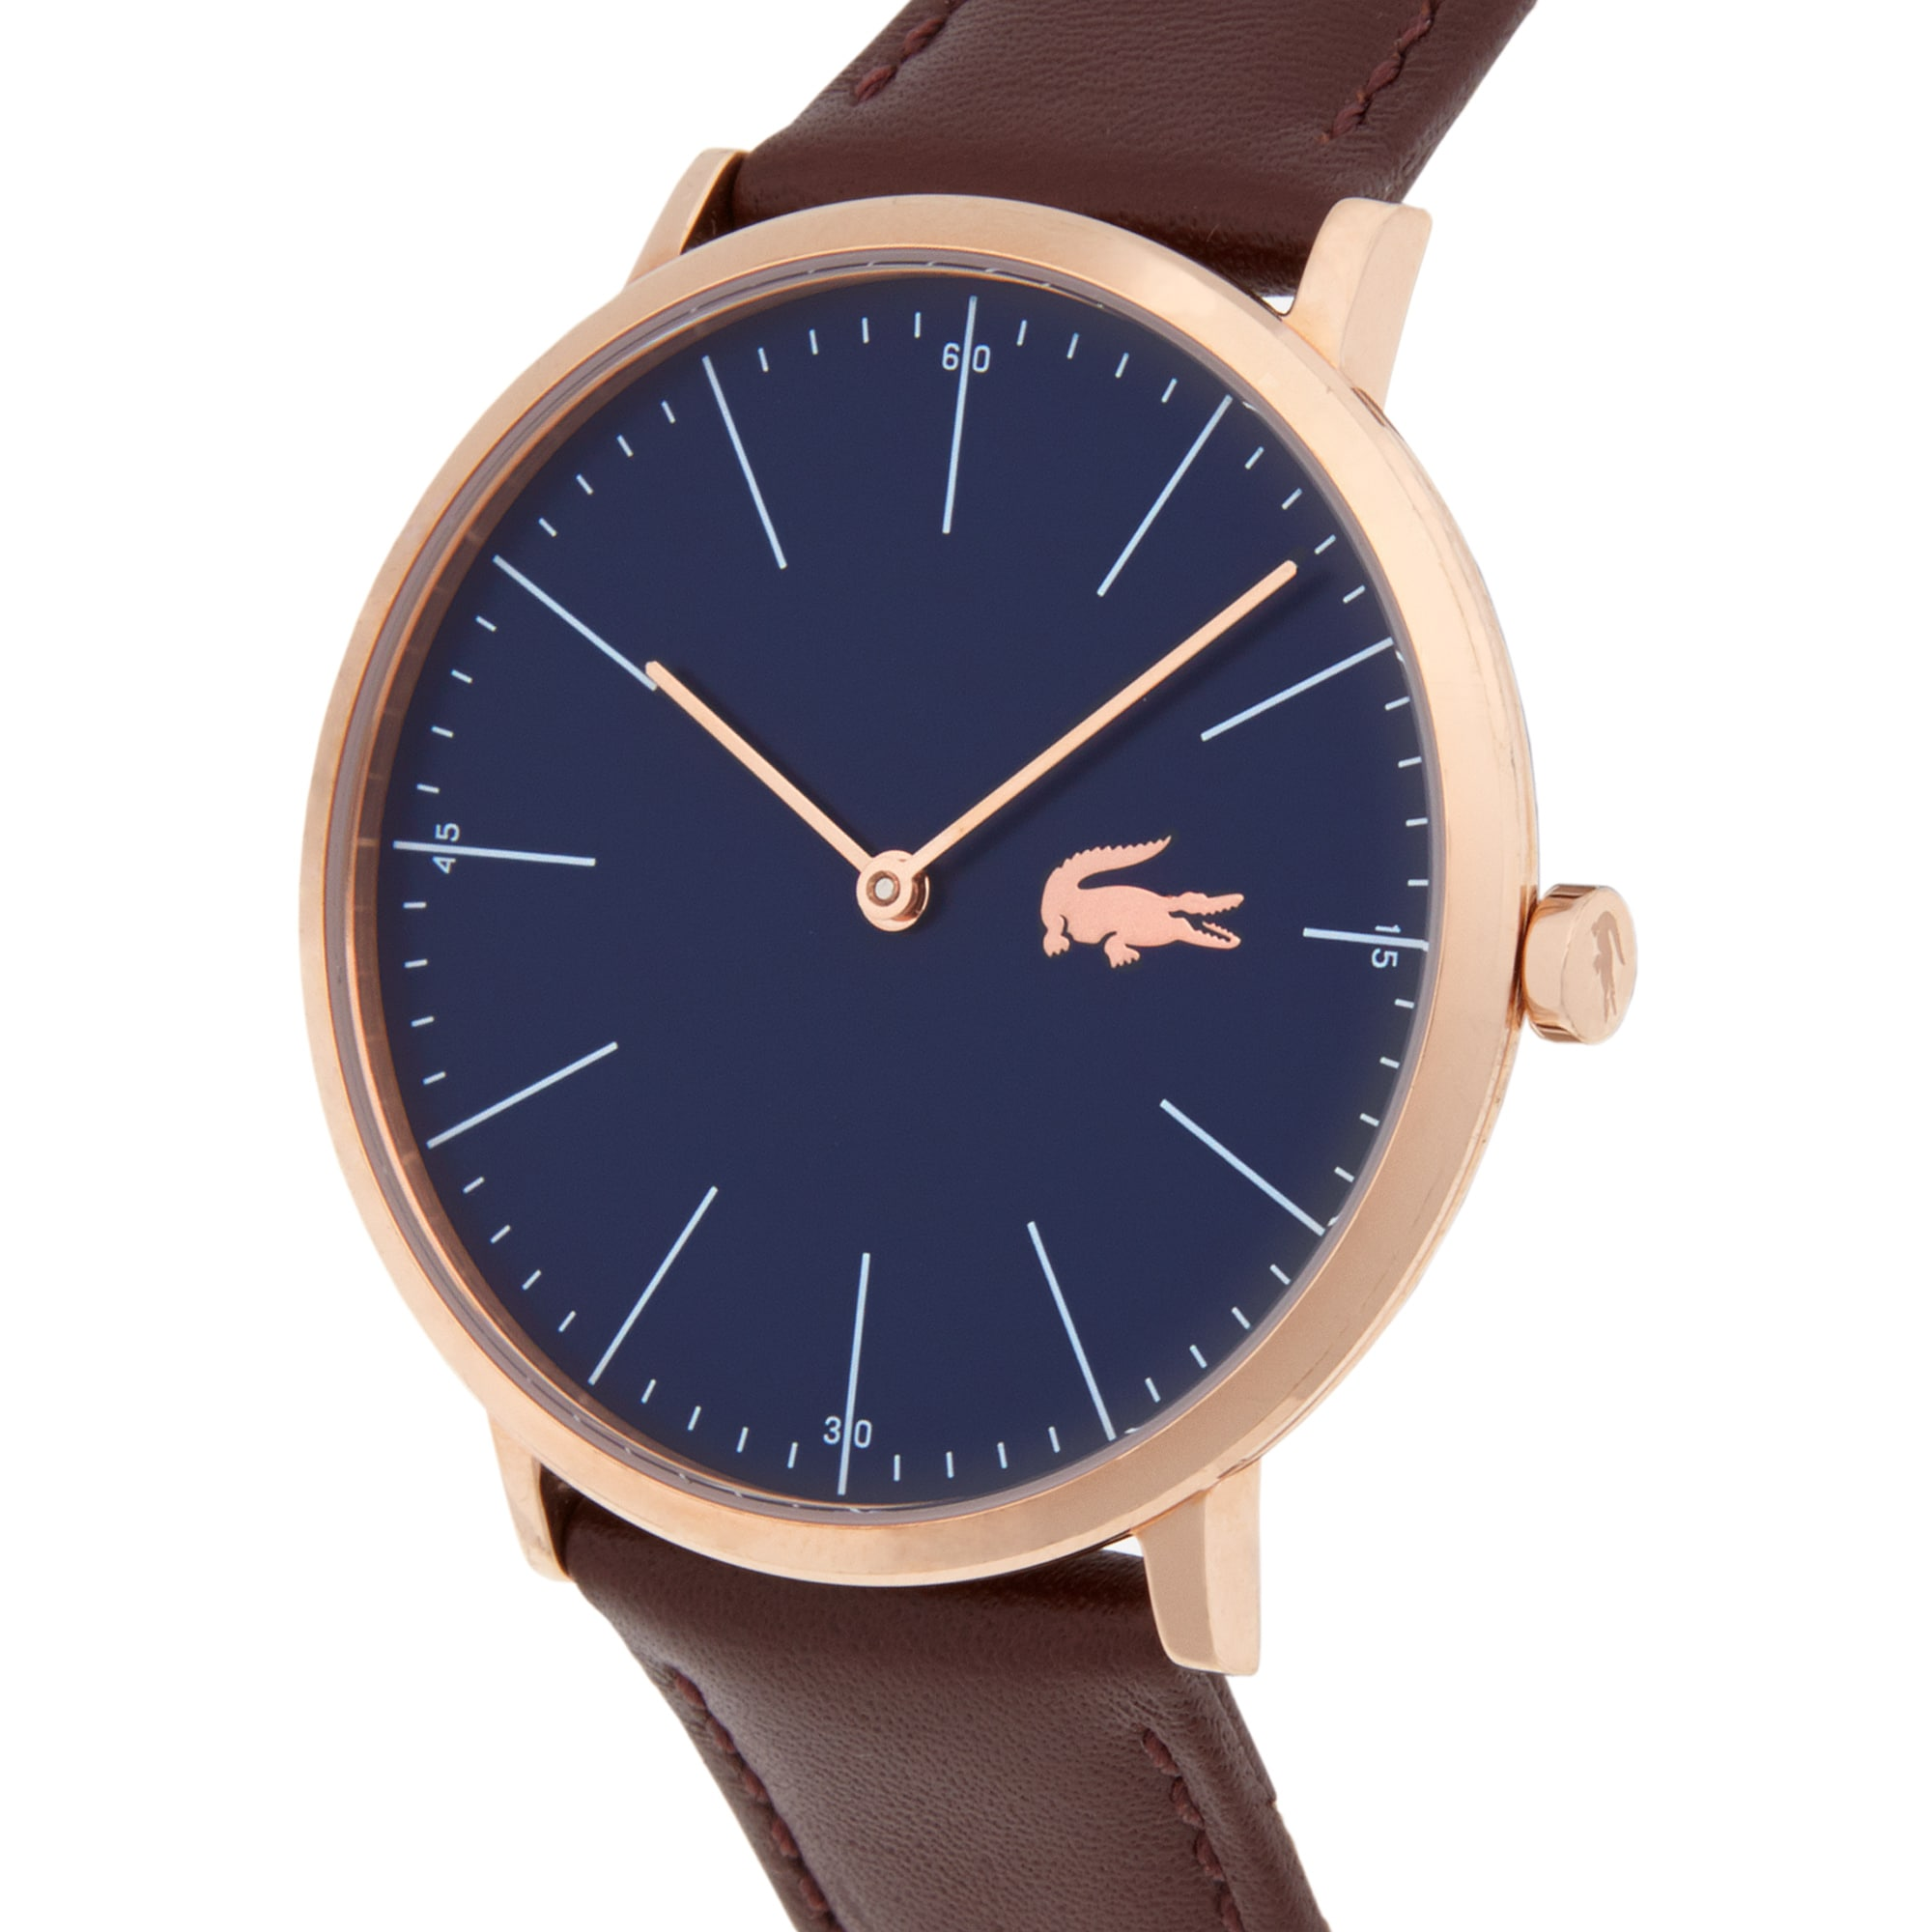 Orologio Moon Extra-piatto Quadrante blu navy Cinturino in pelle marrone